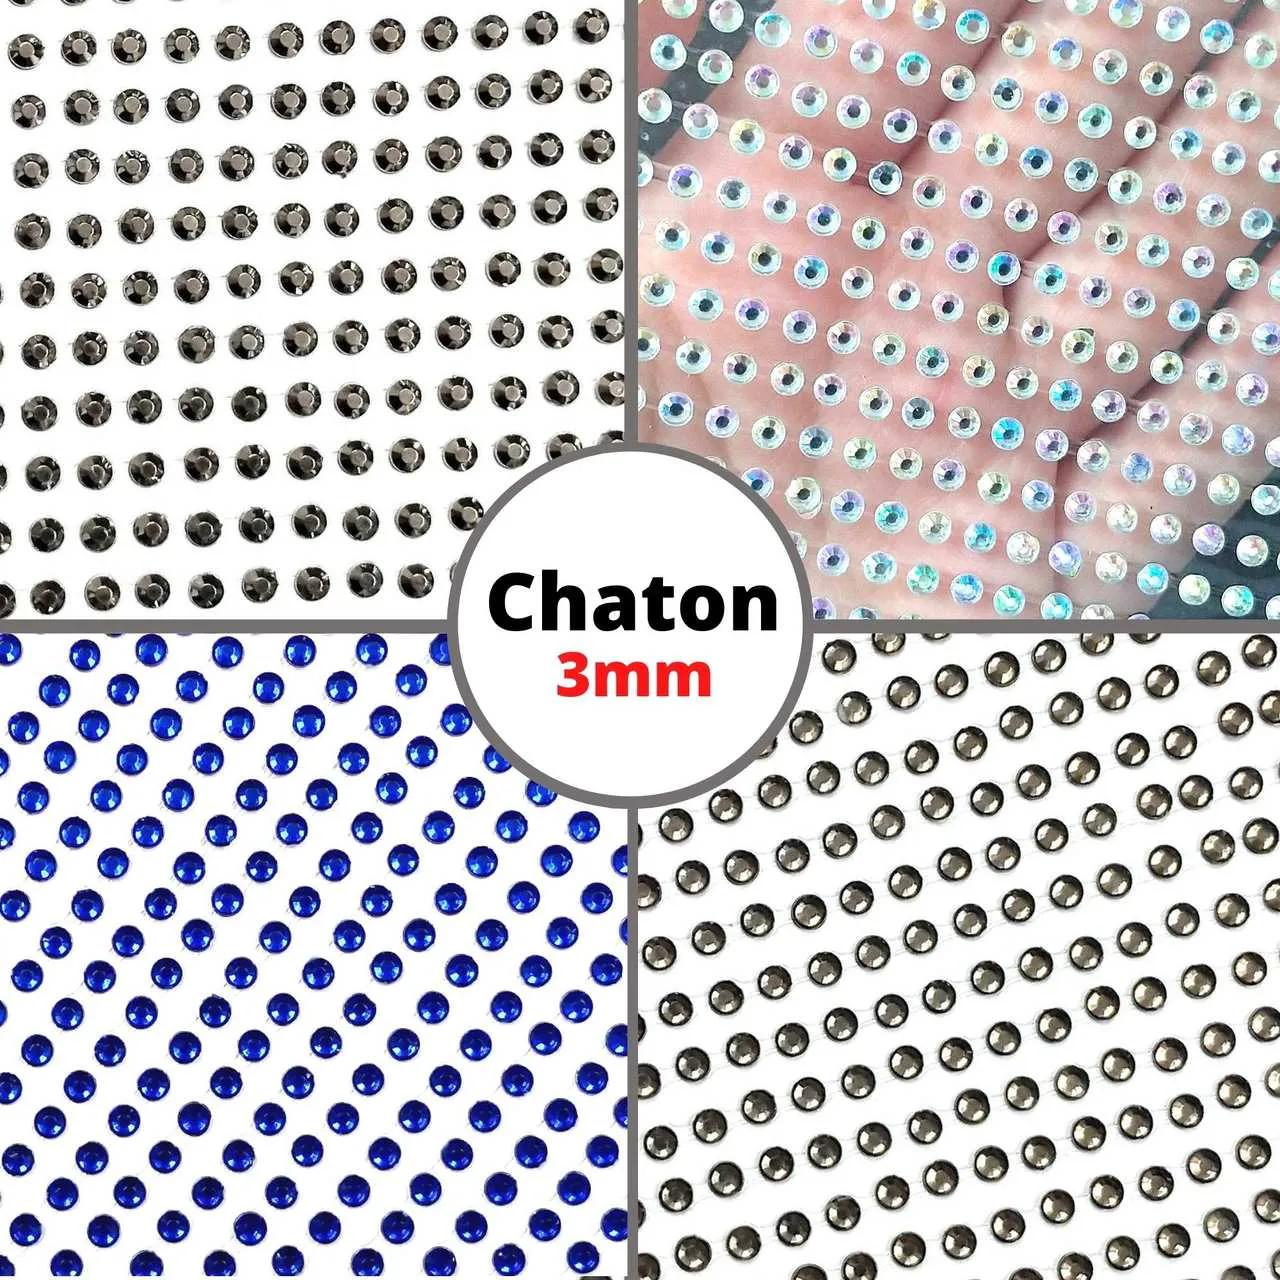 Cartela Adesiva Chaton 3mm - 1 cartela